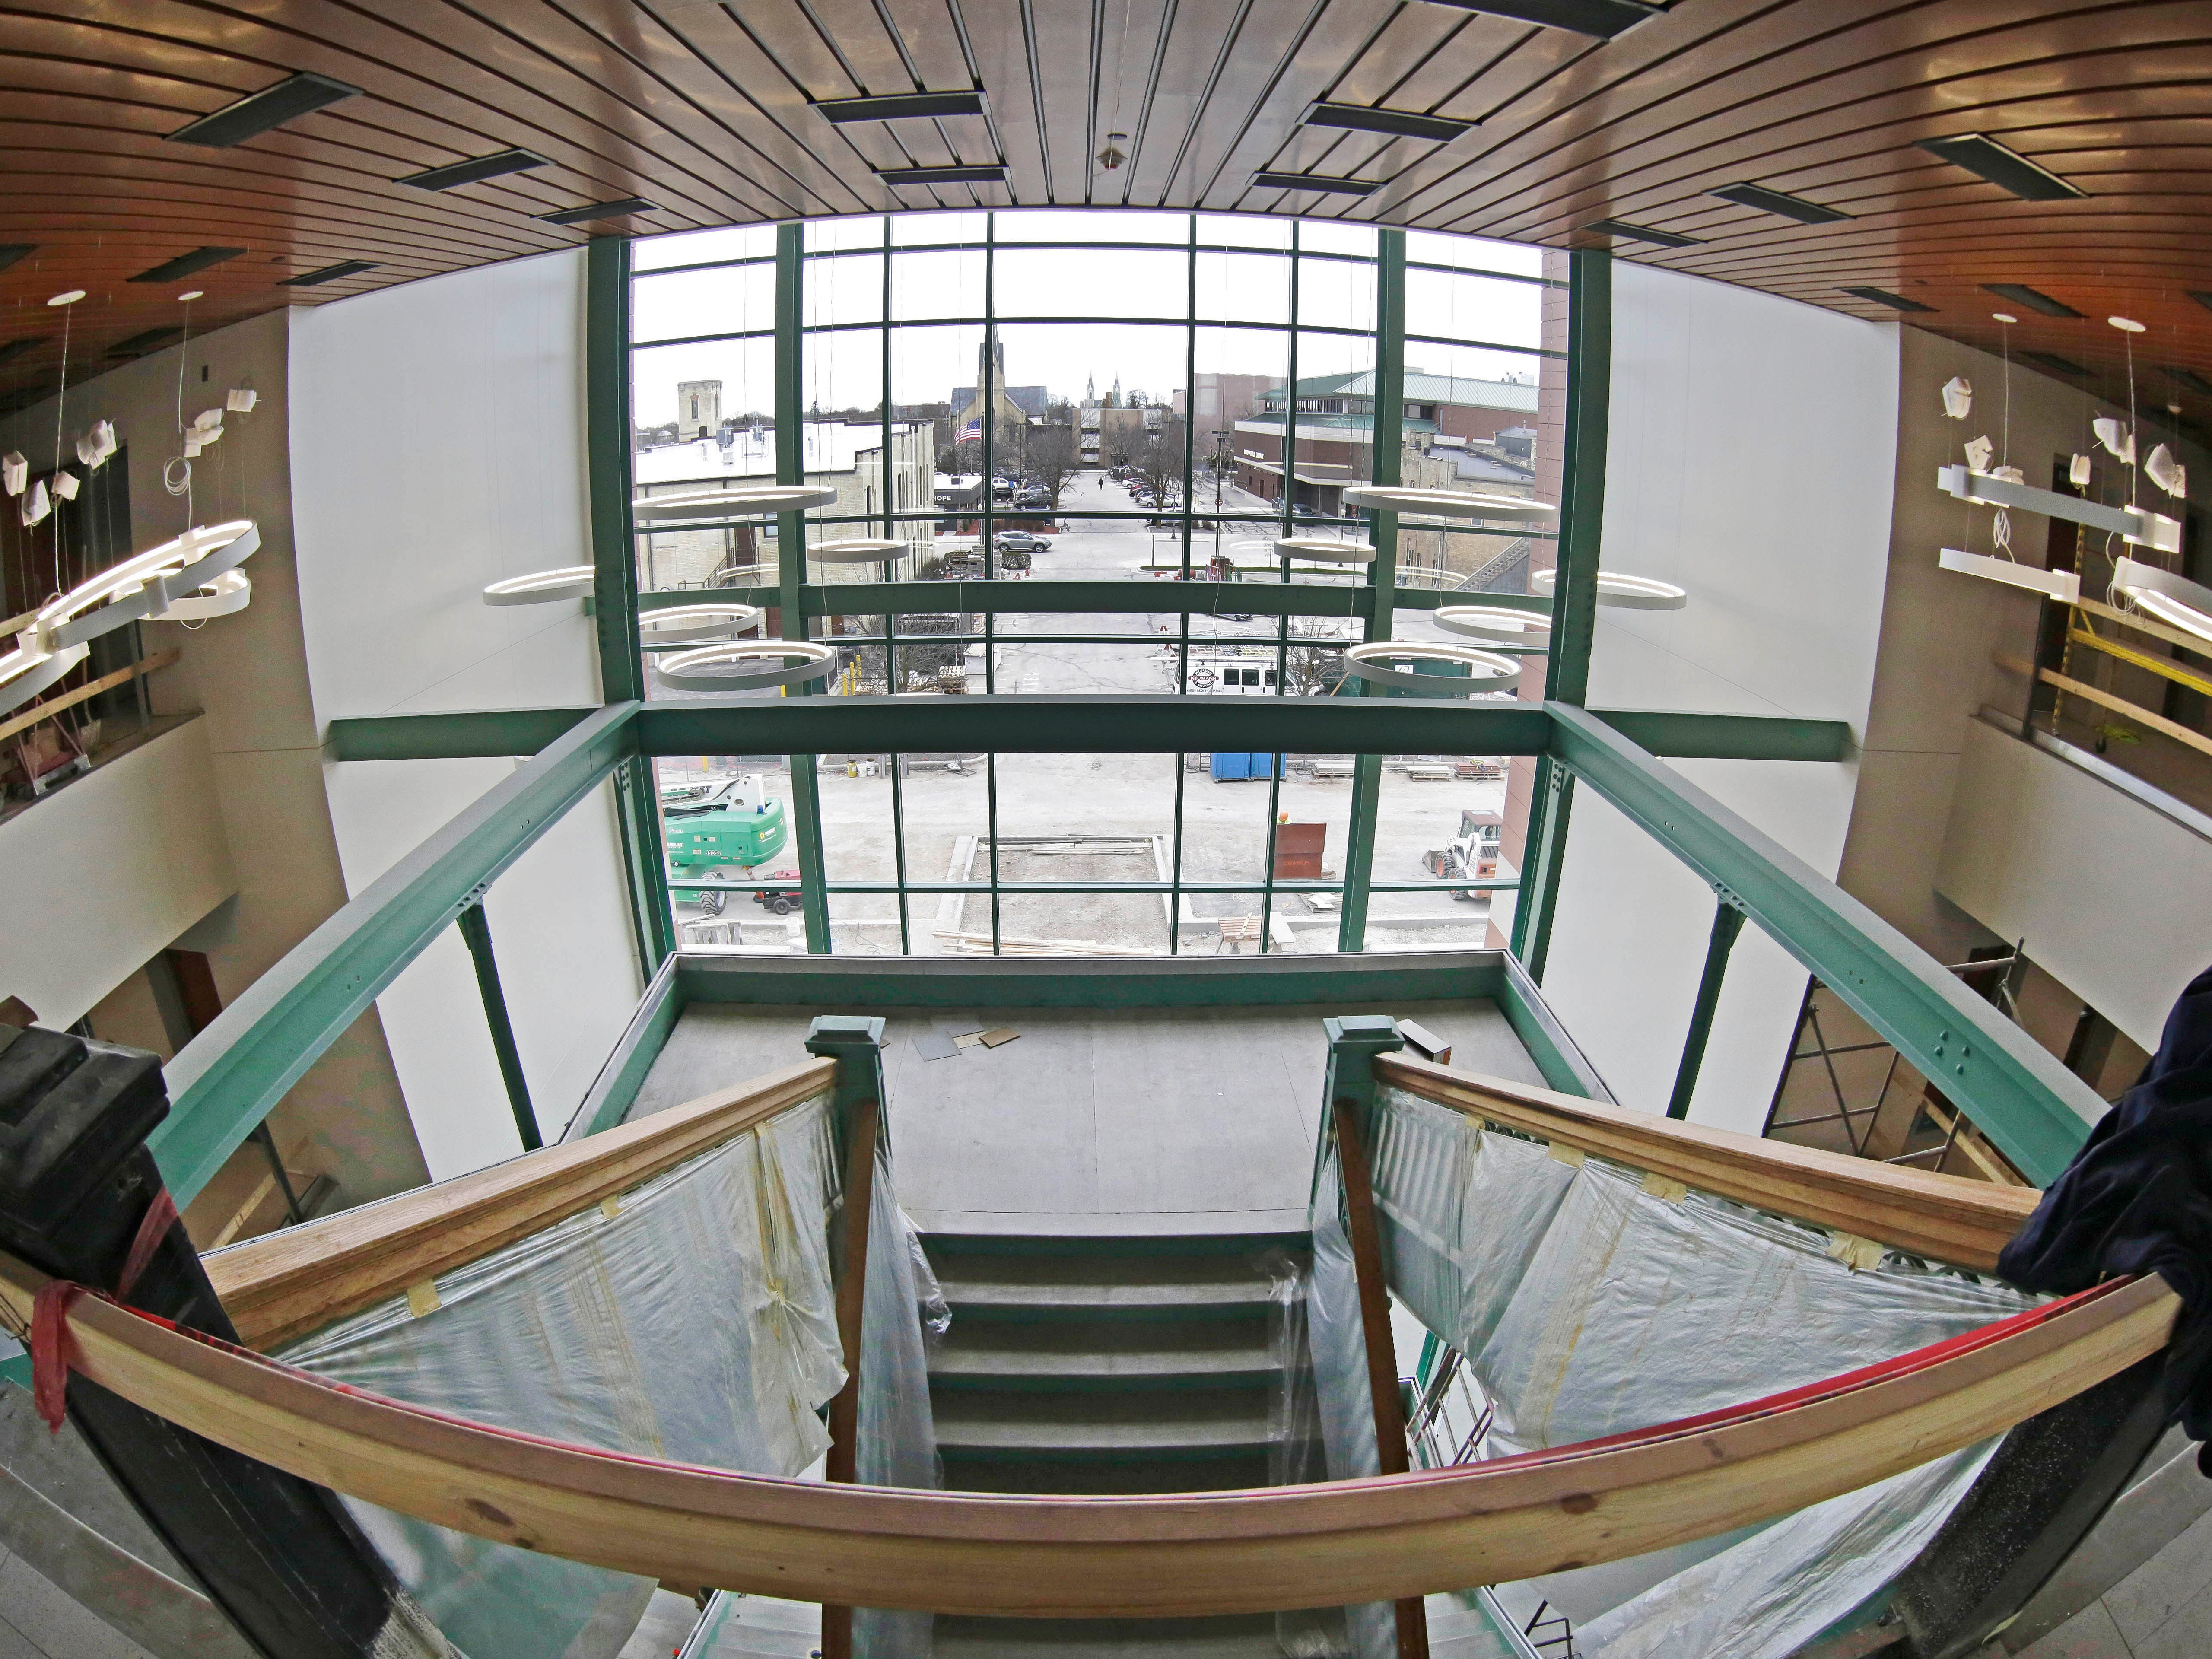 A view from the third floor at Sheboygan City Hall as seen, Tuesday, May 7, 2019, in Sheboygan, Wis.